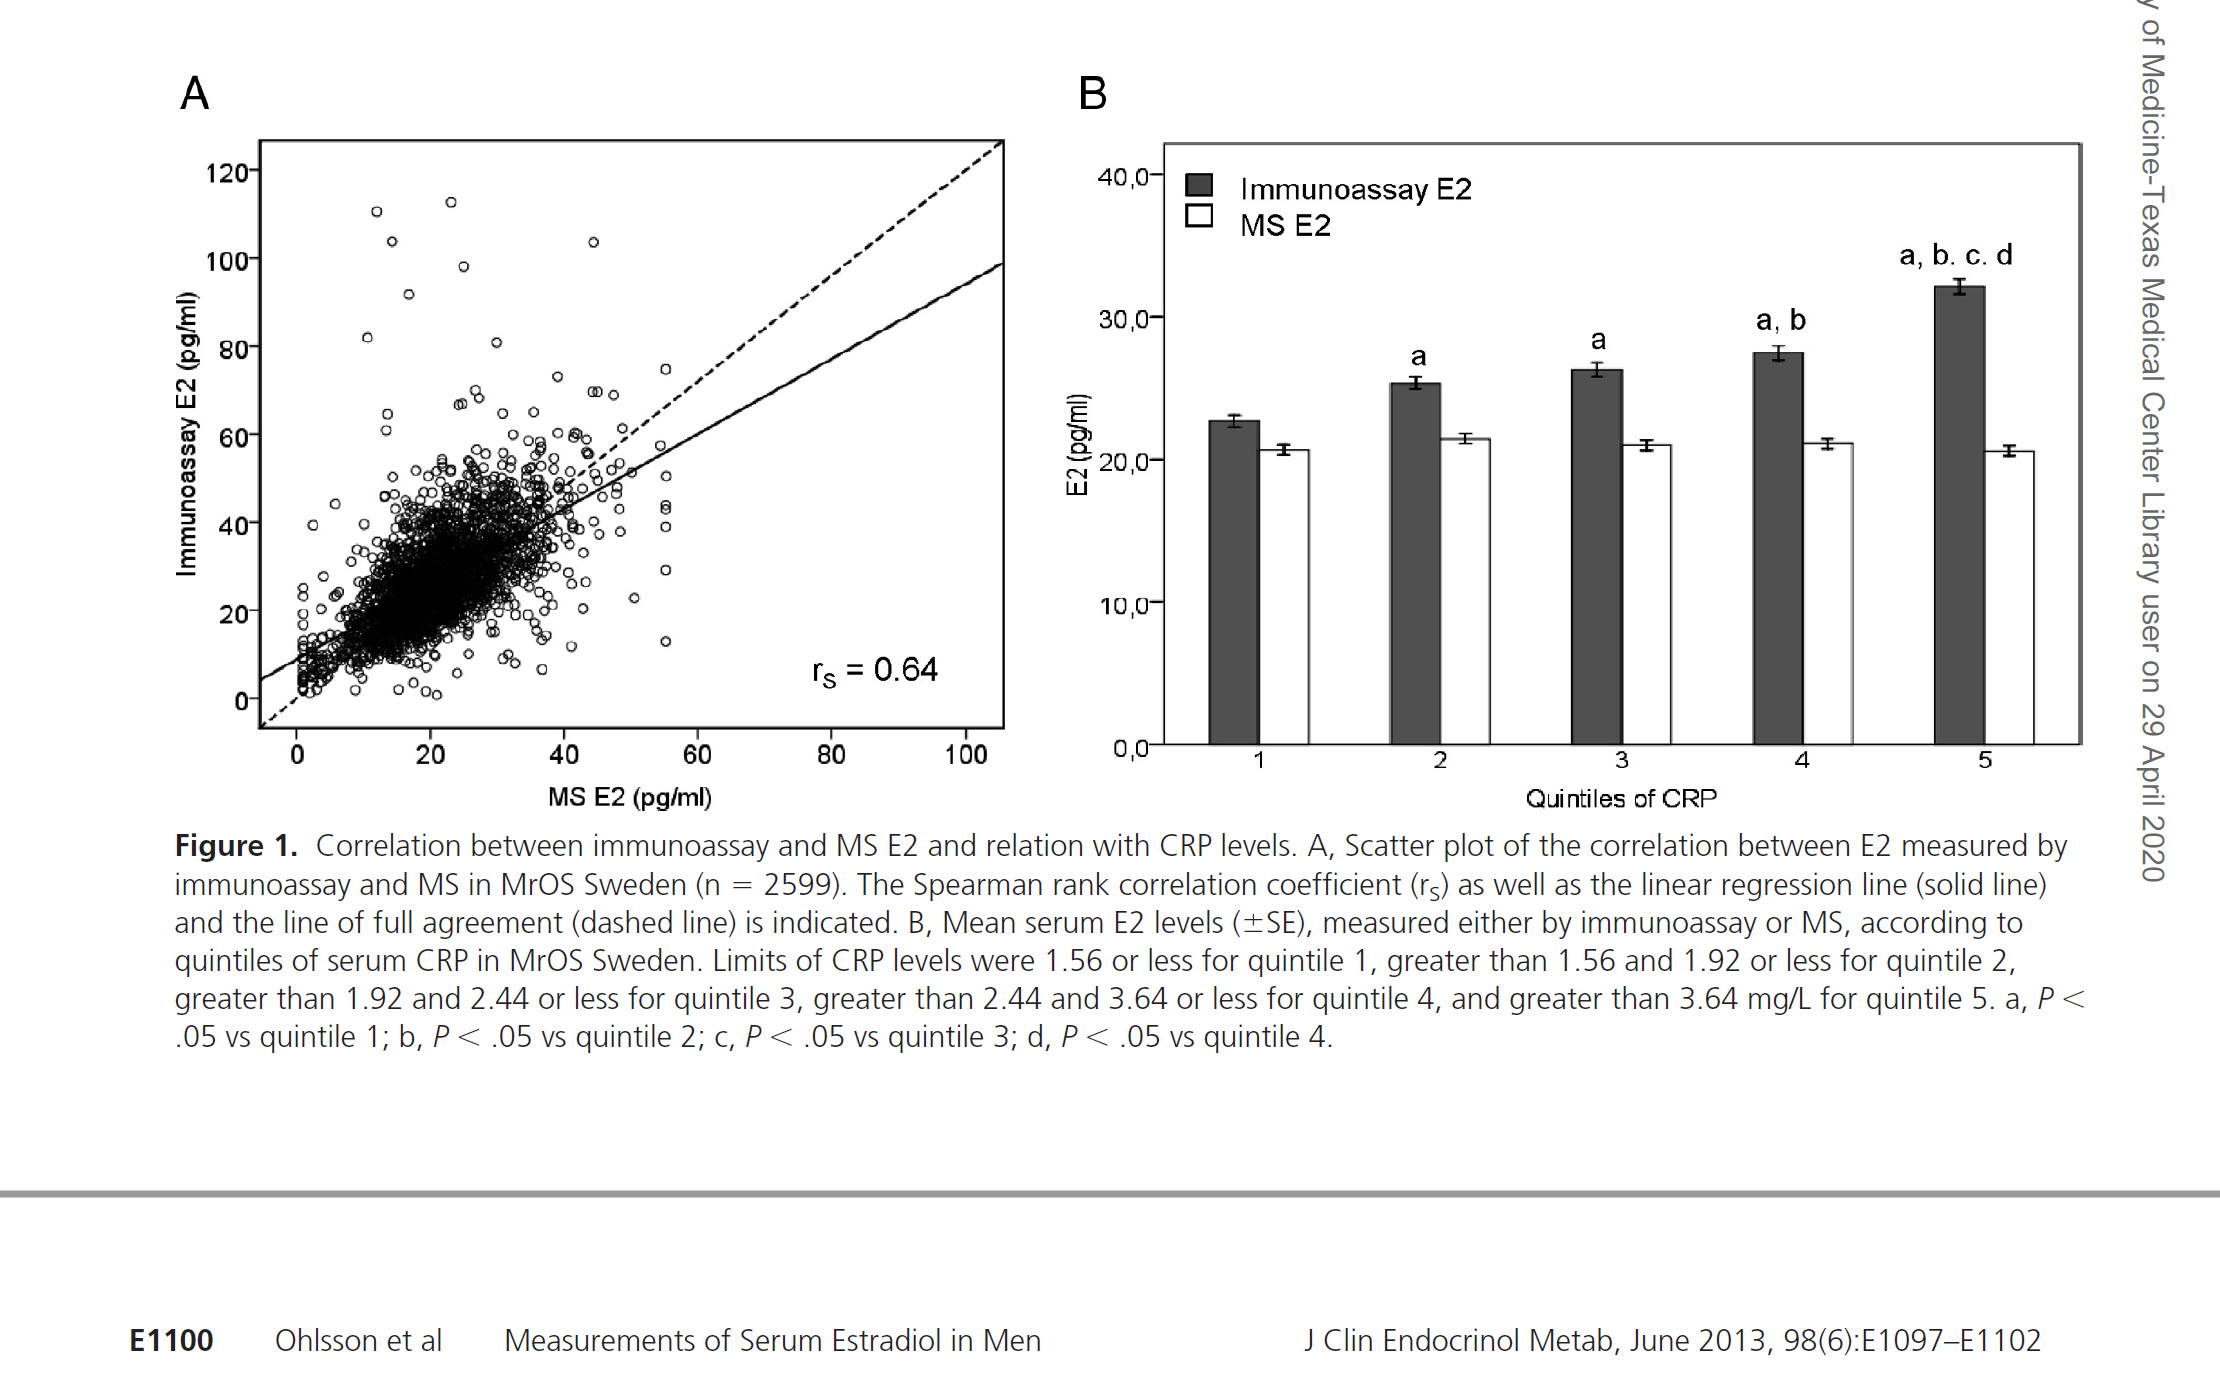 immunoassay estradiol versus sensitive estradiol test in men.jpg